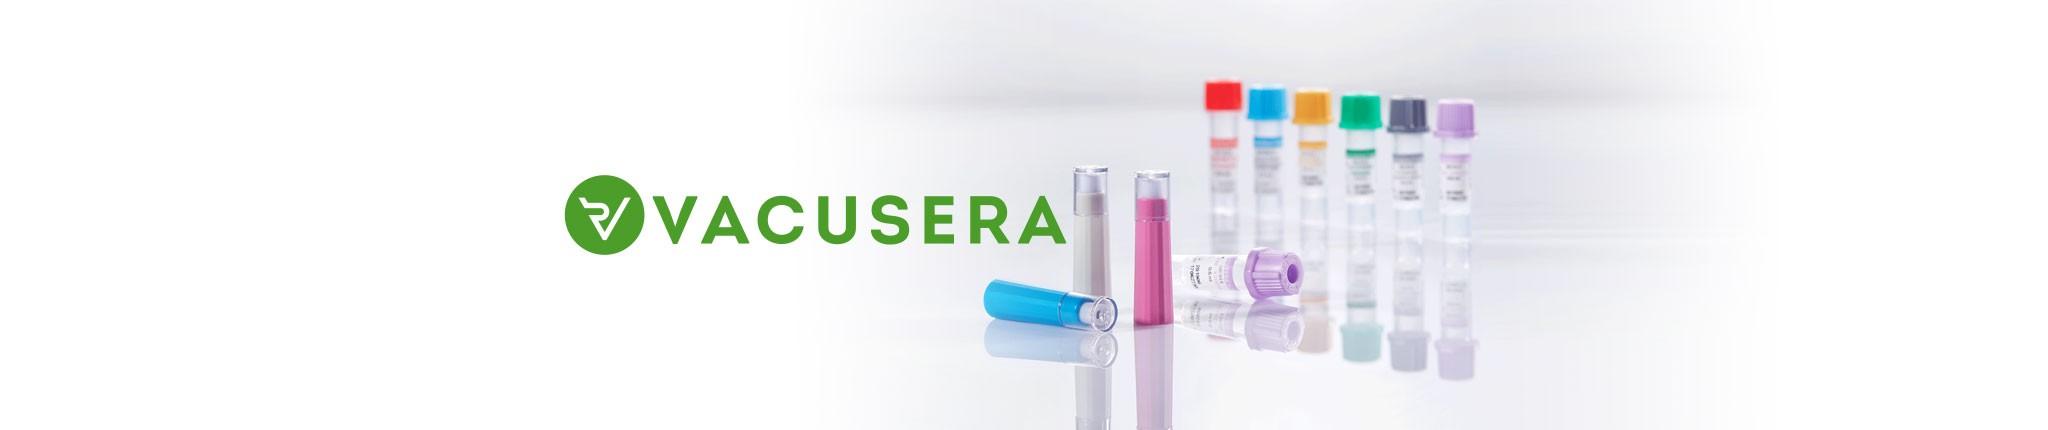 Vacusera Mini Capillary Blood Collection System